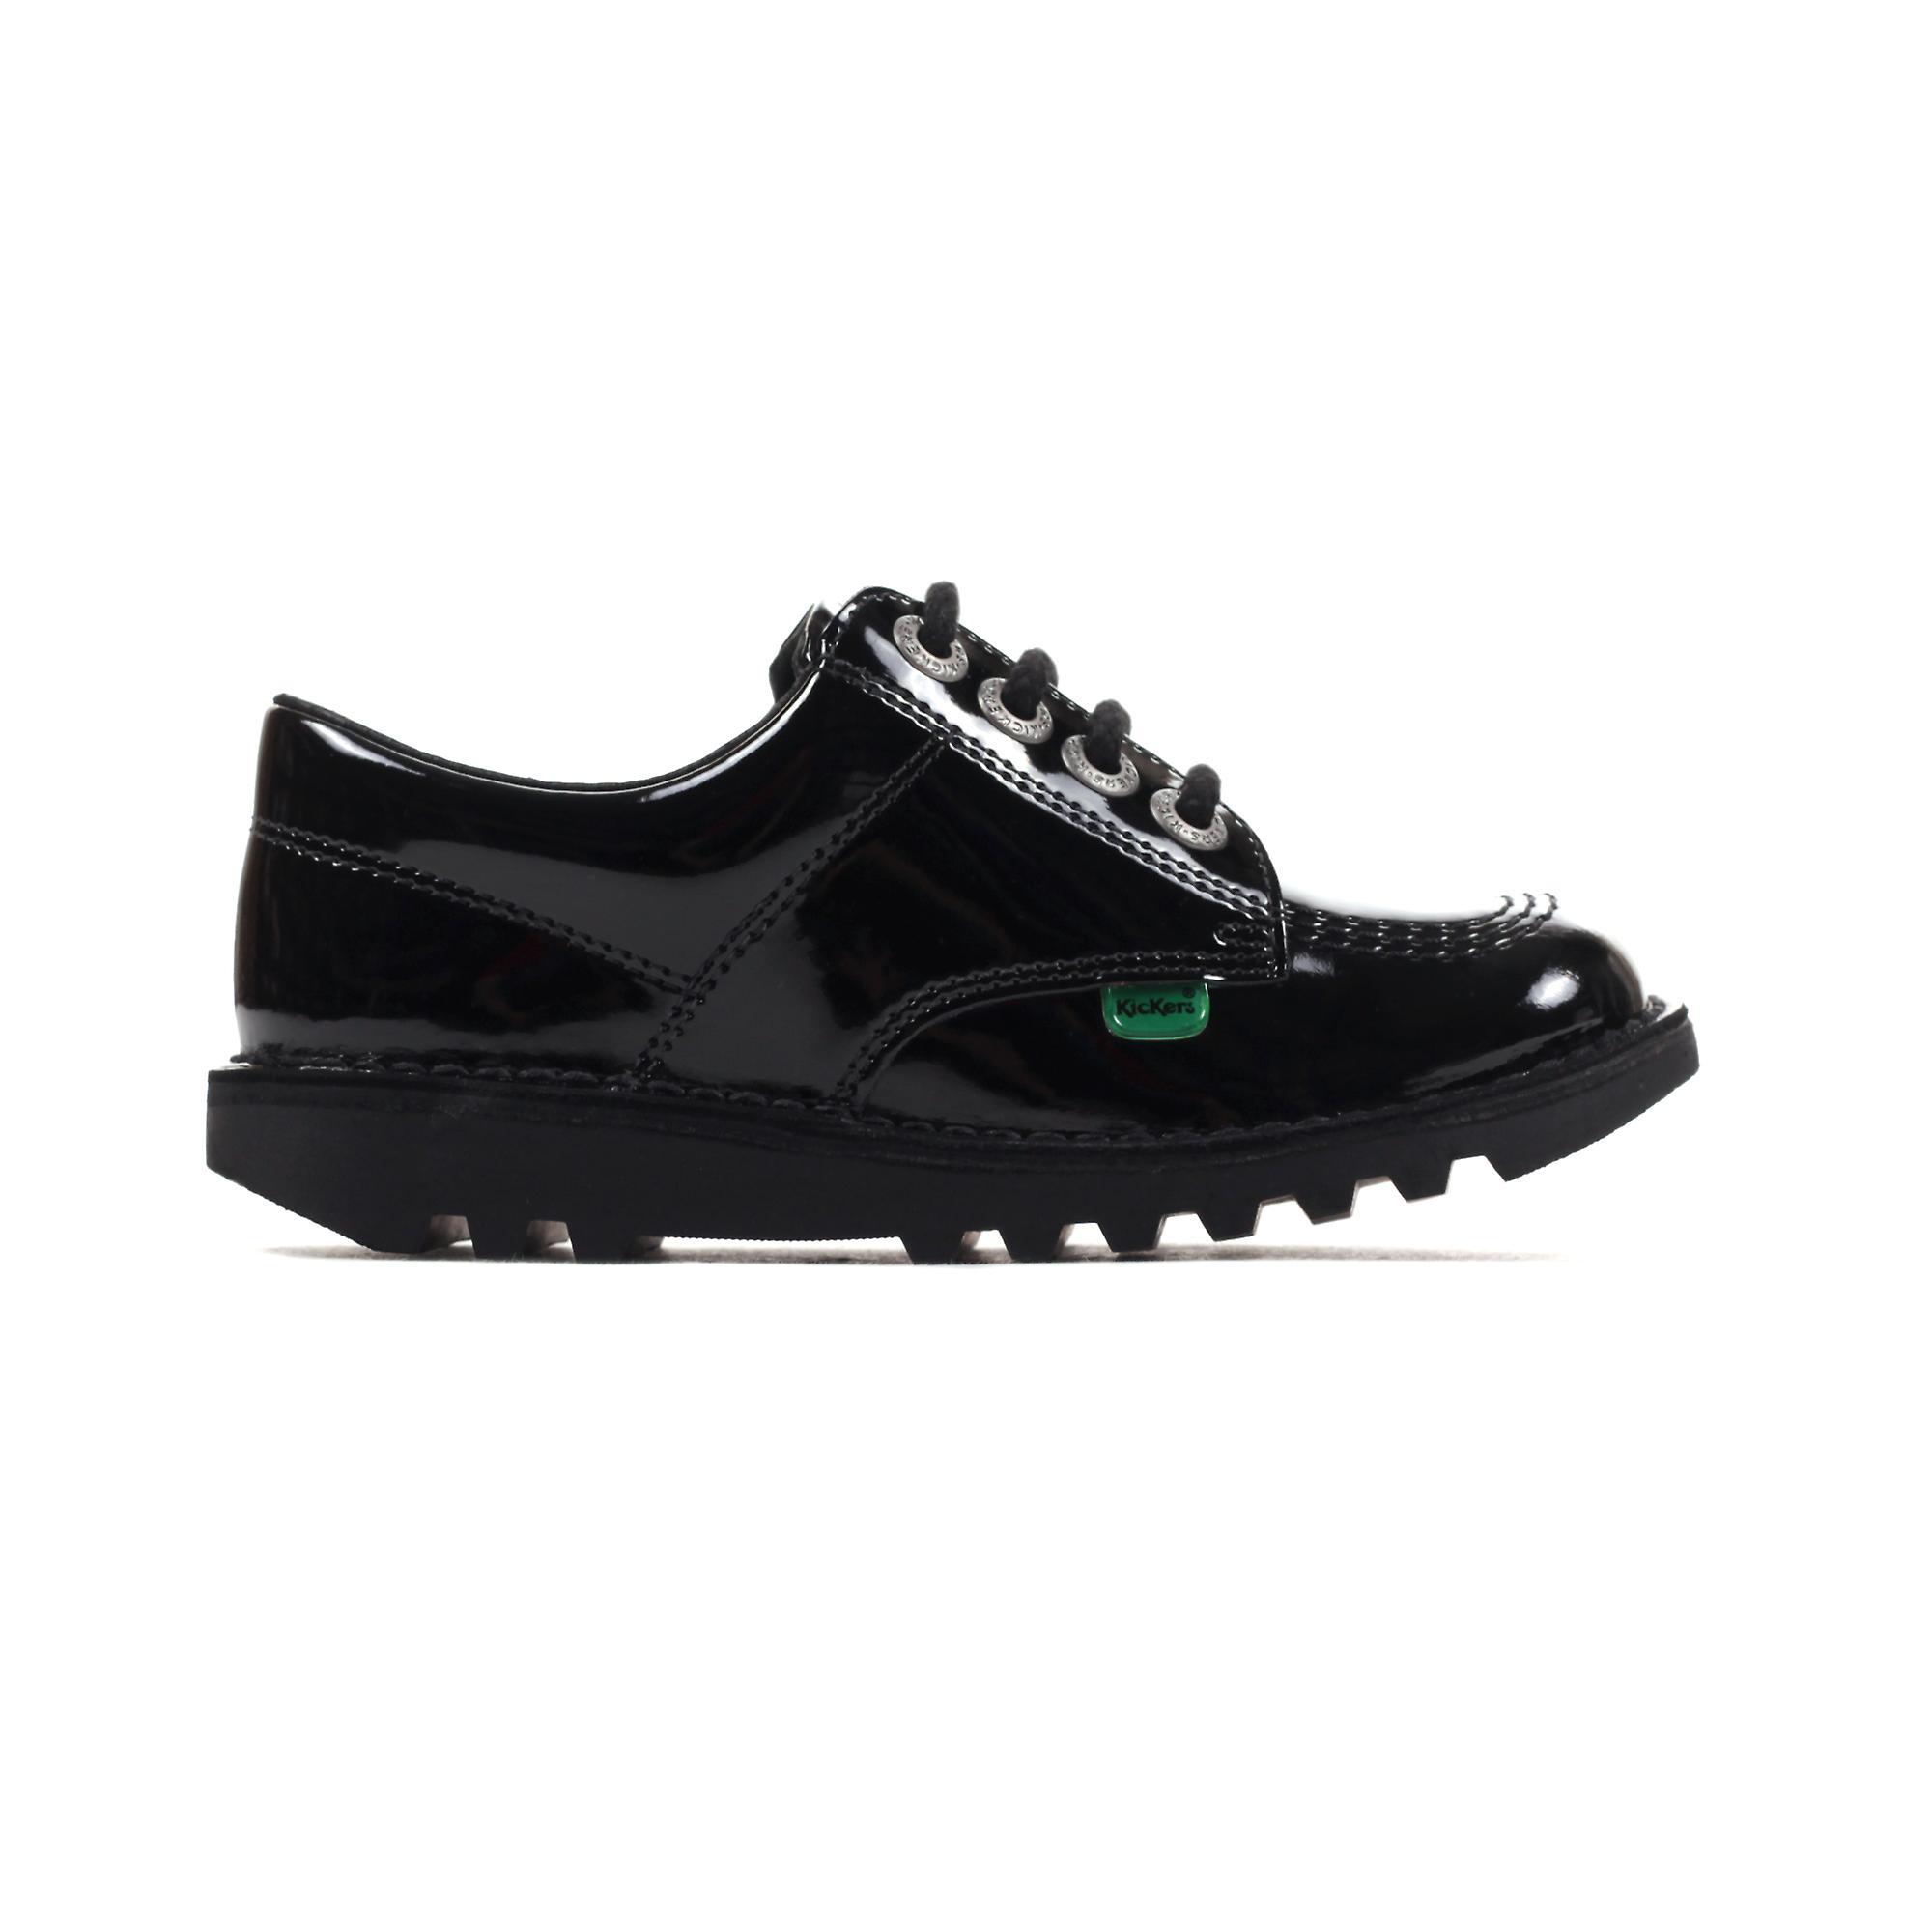 Kickers Classic Kick Lo Patent Leather Junior Girls School Shoe Black